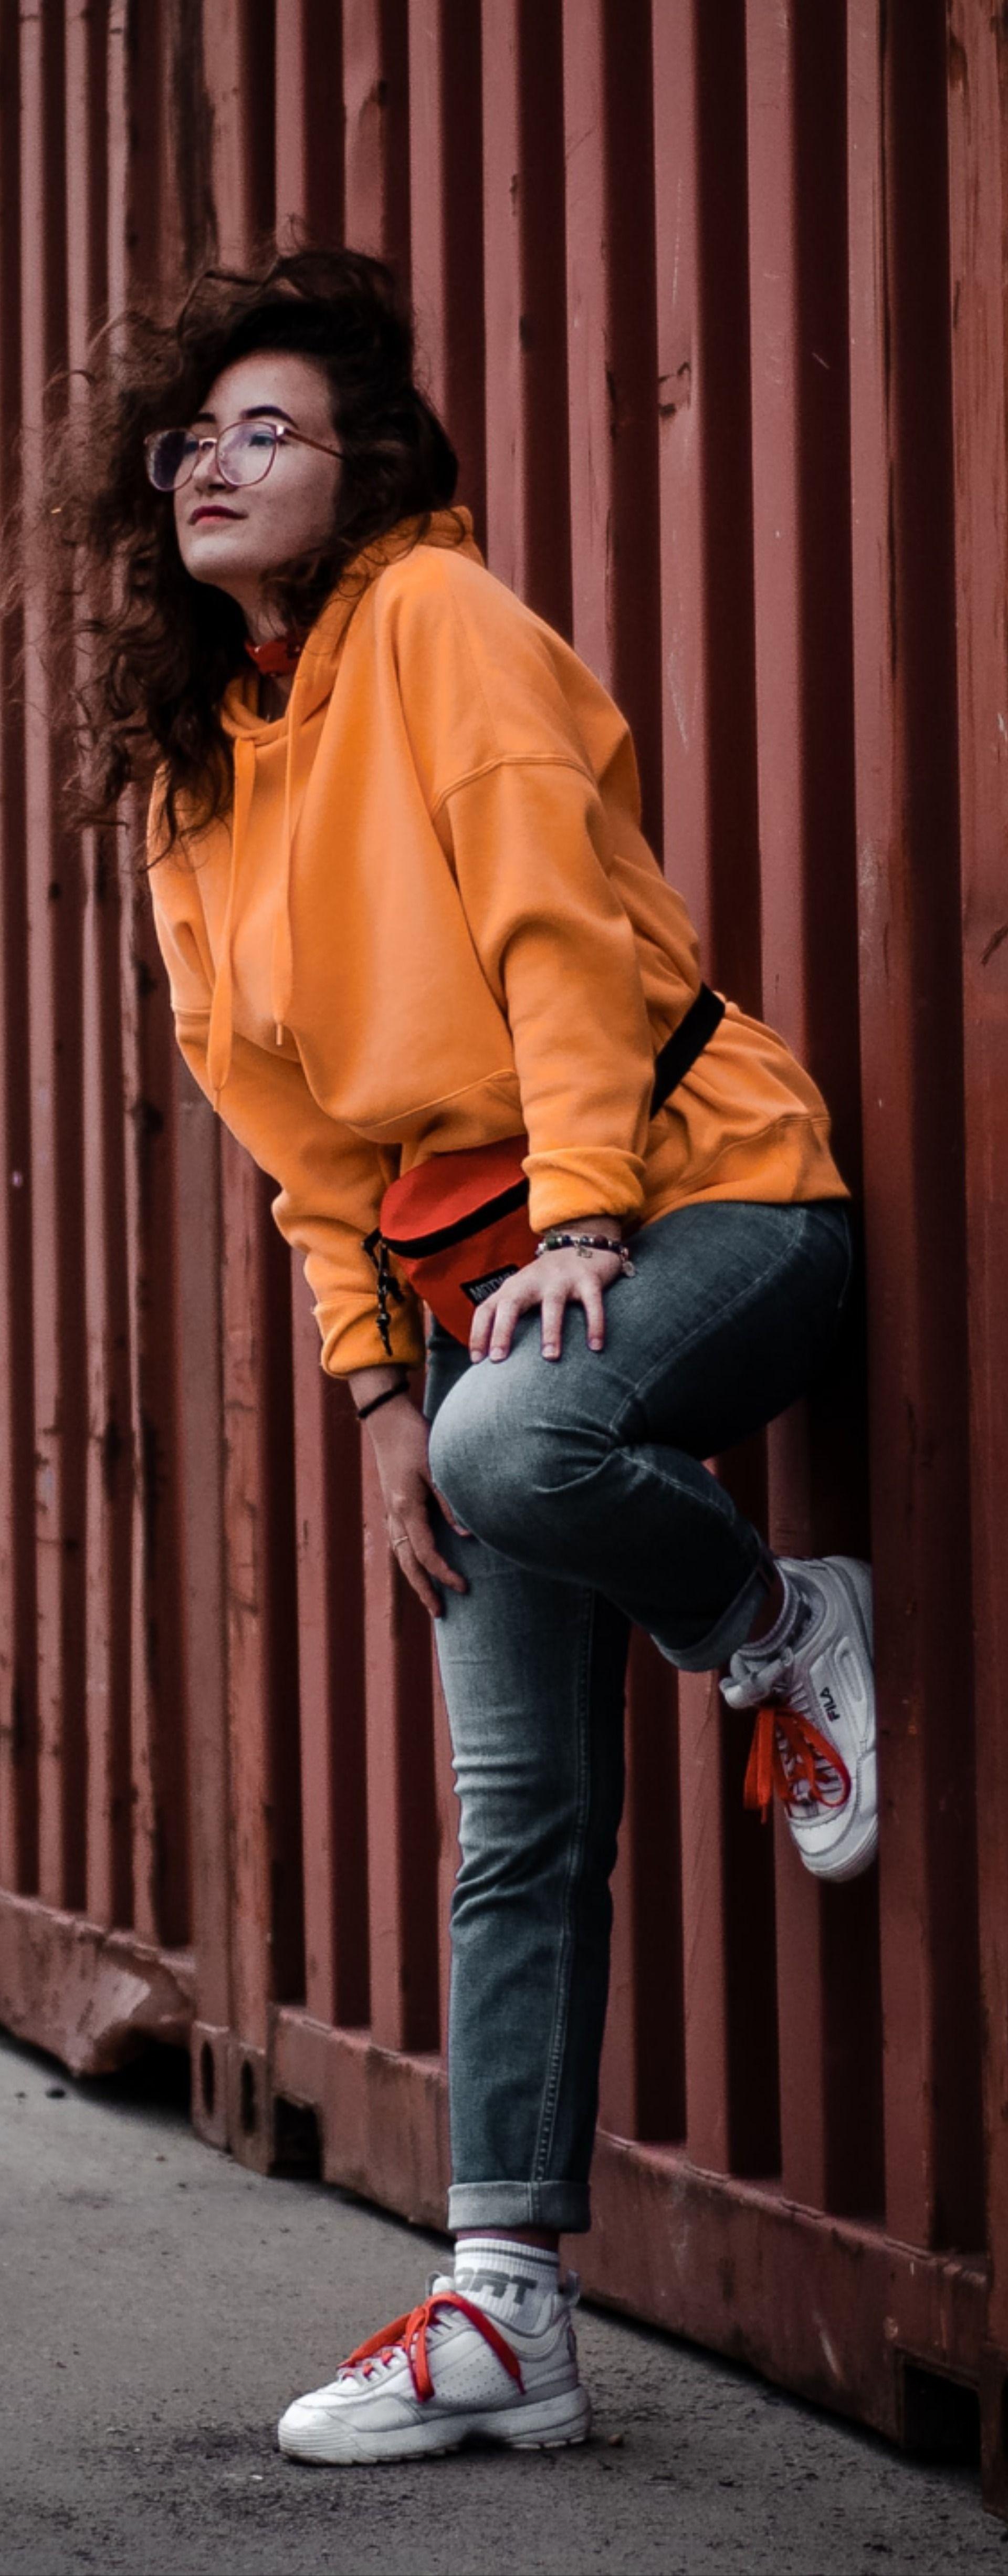 New Hooded Sweatshirts DB Women in 2020 Fashion